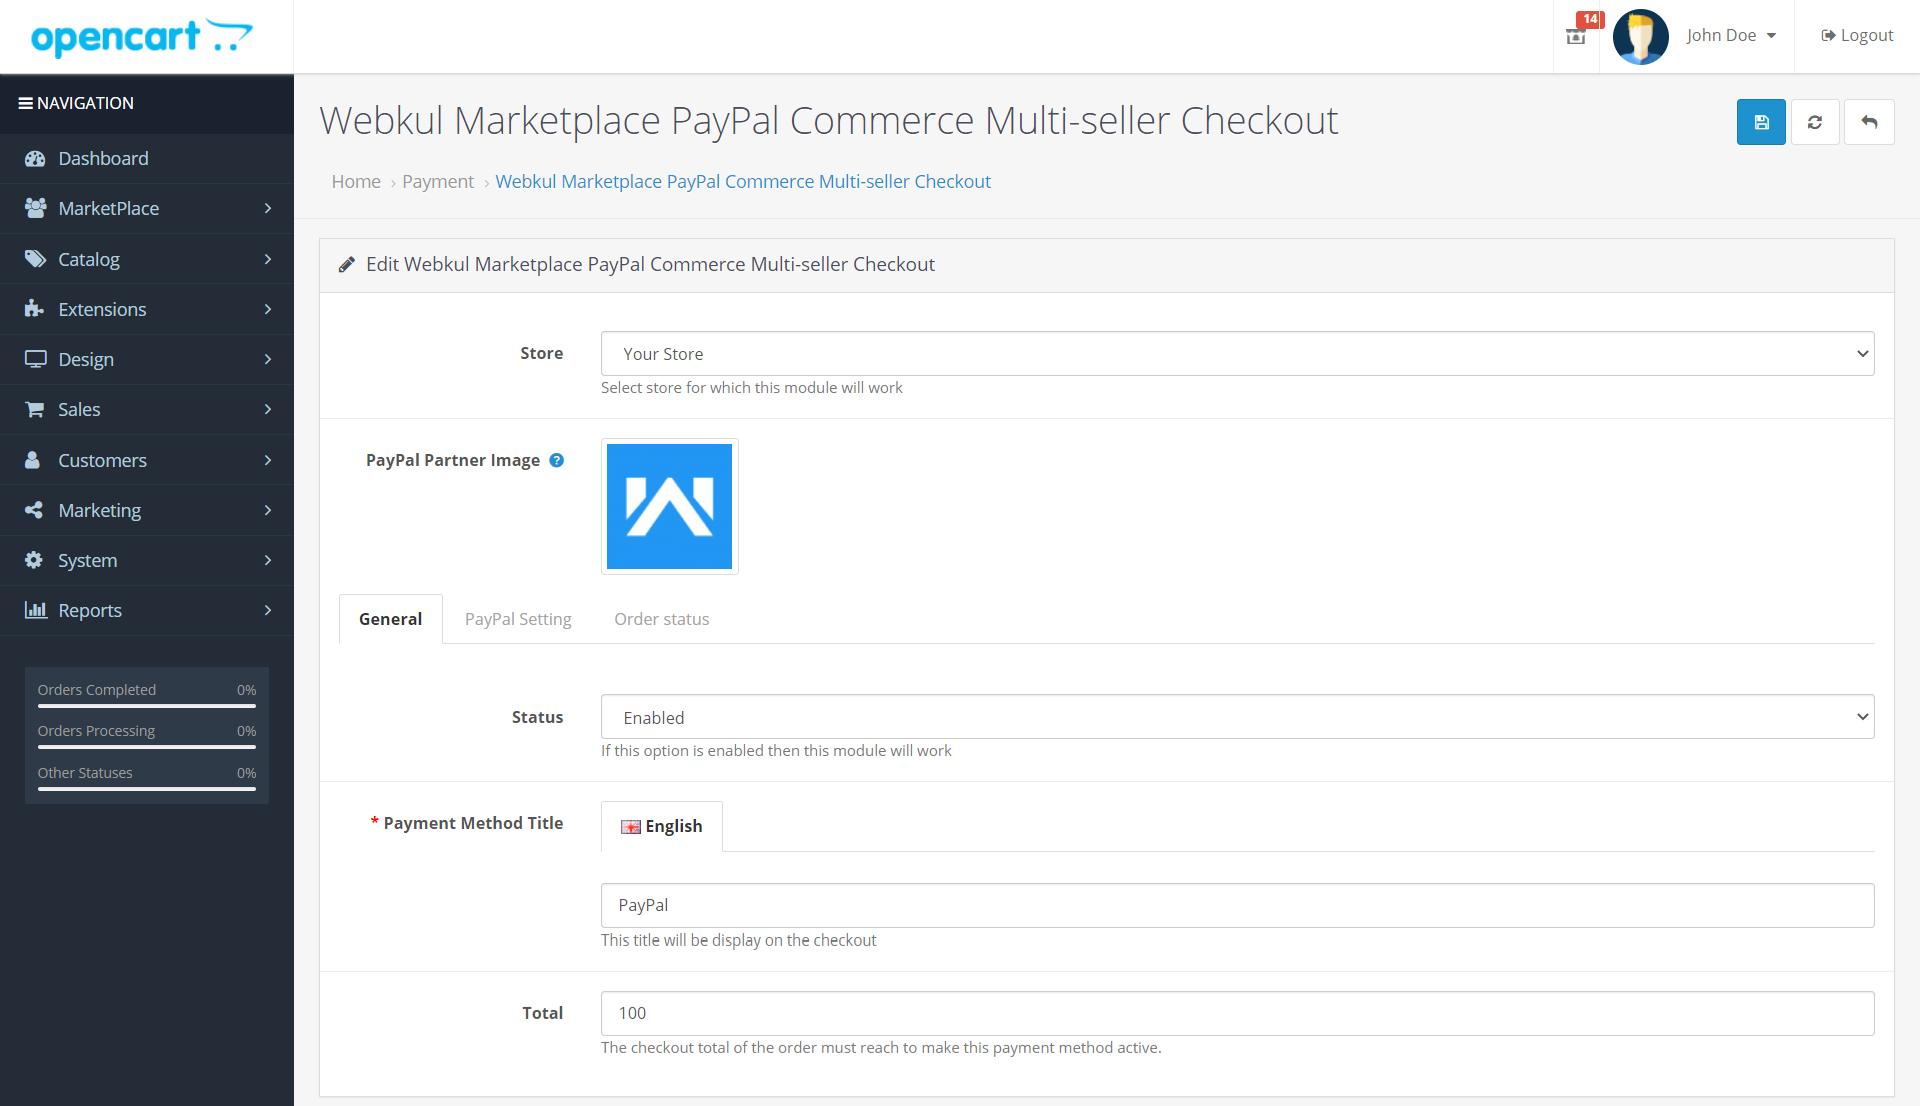 Webkul-Marketplace-PayPal-Commerce-Multi-seller-Checkout-1-1